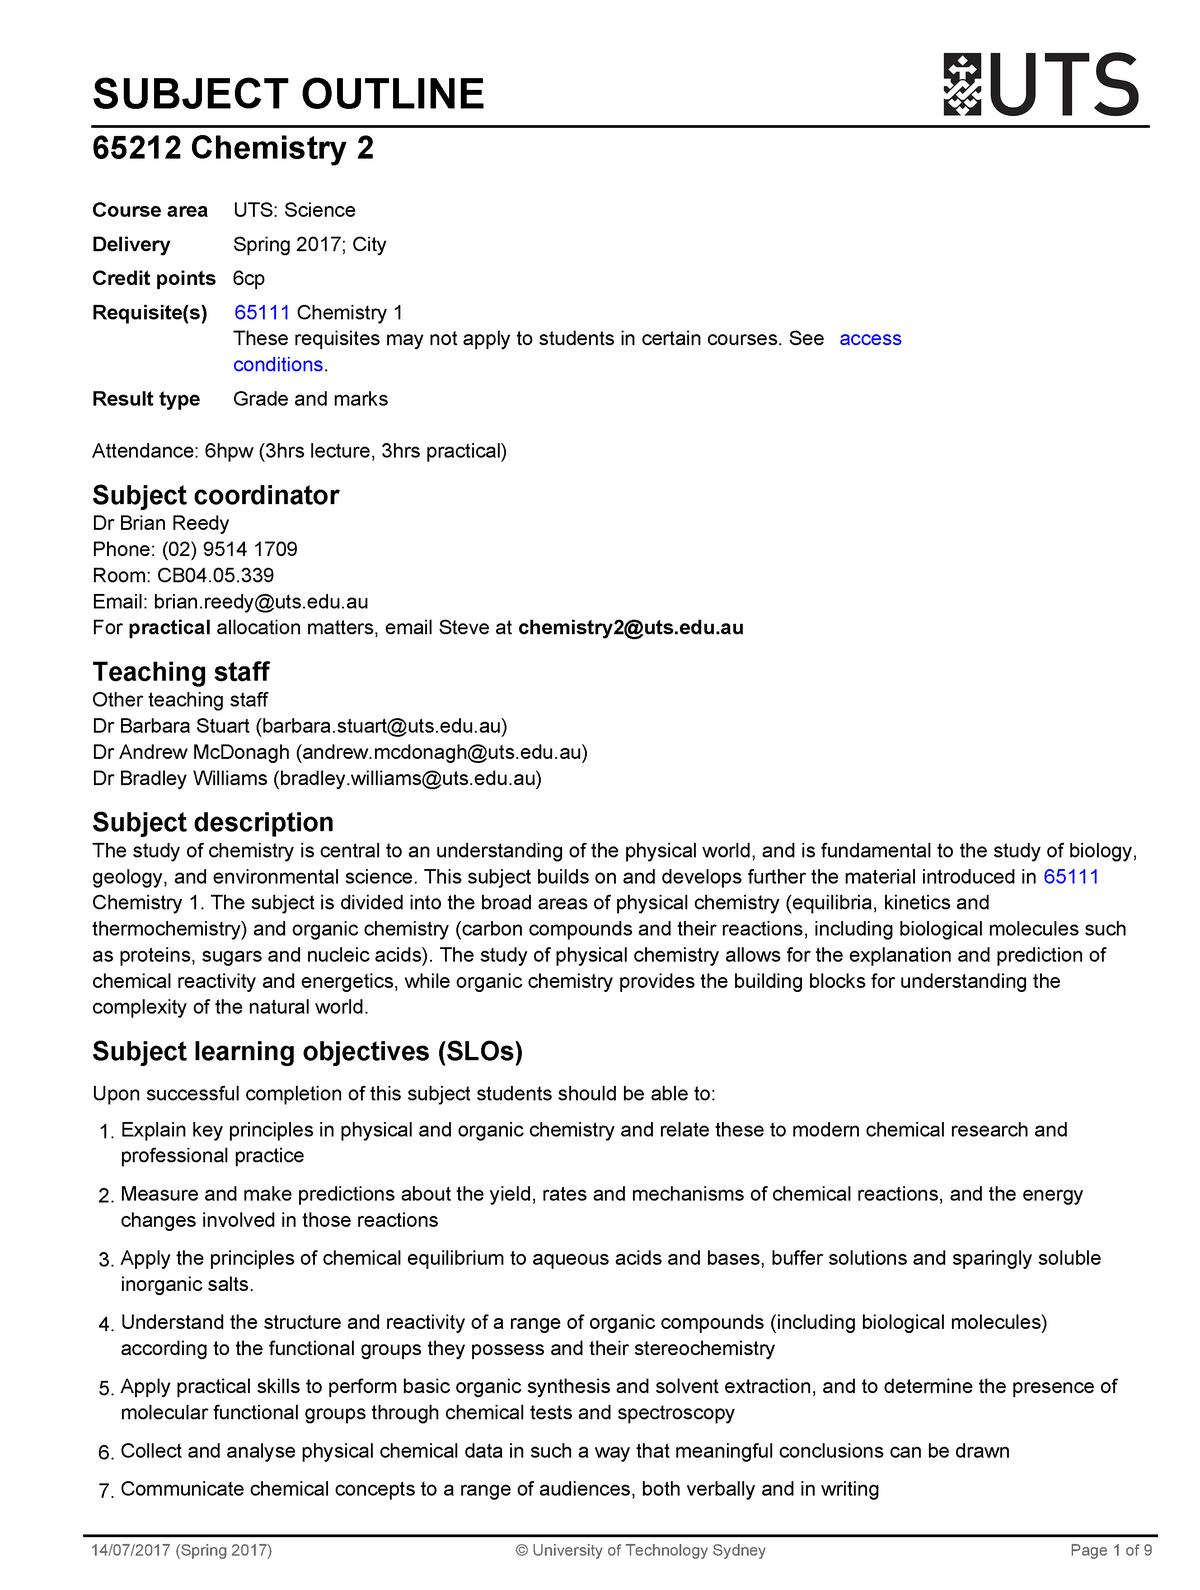 Chemistry 2 Outline - 065212 : Chemistry 2 - StuDocu